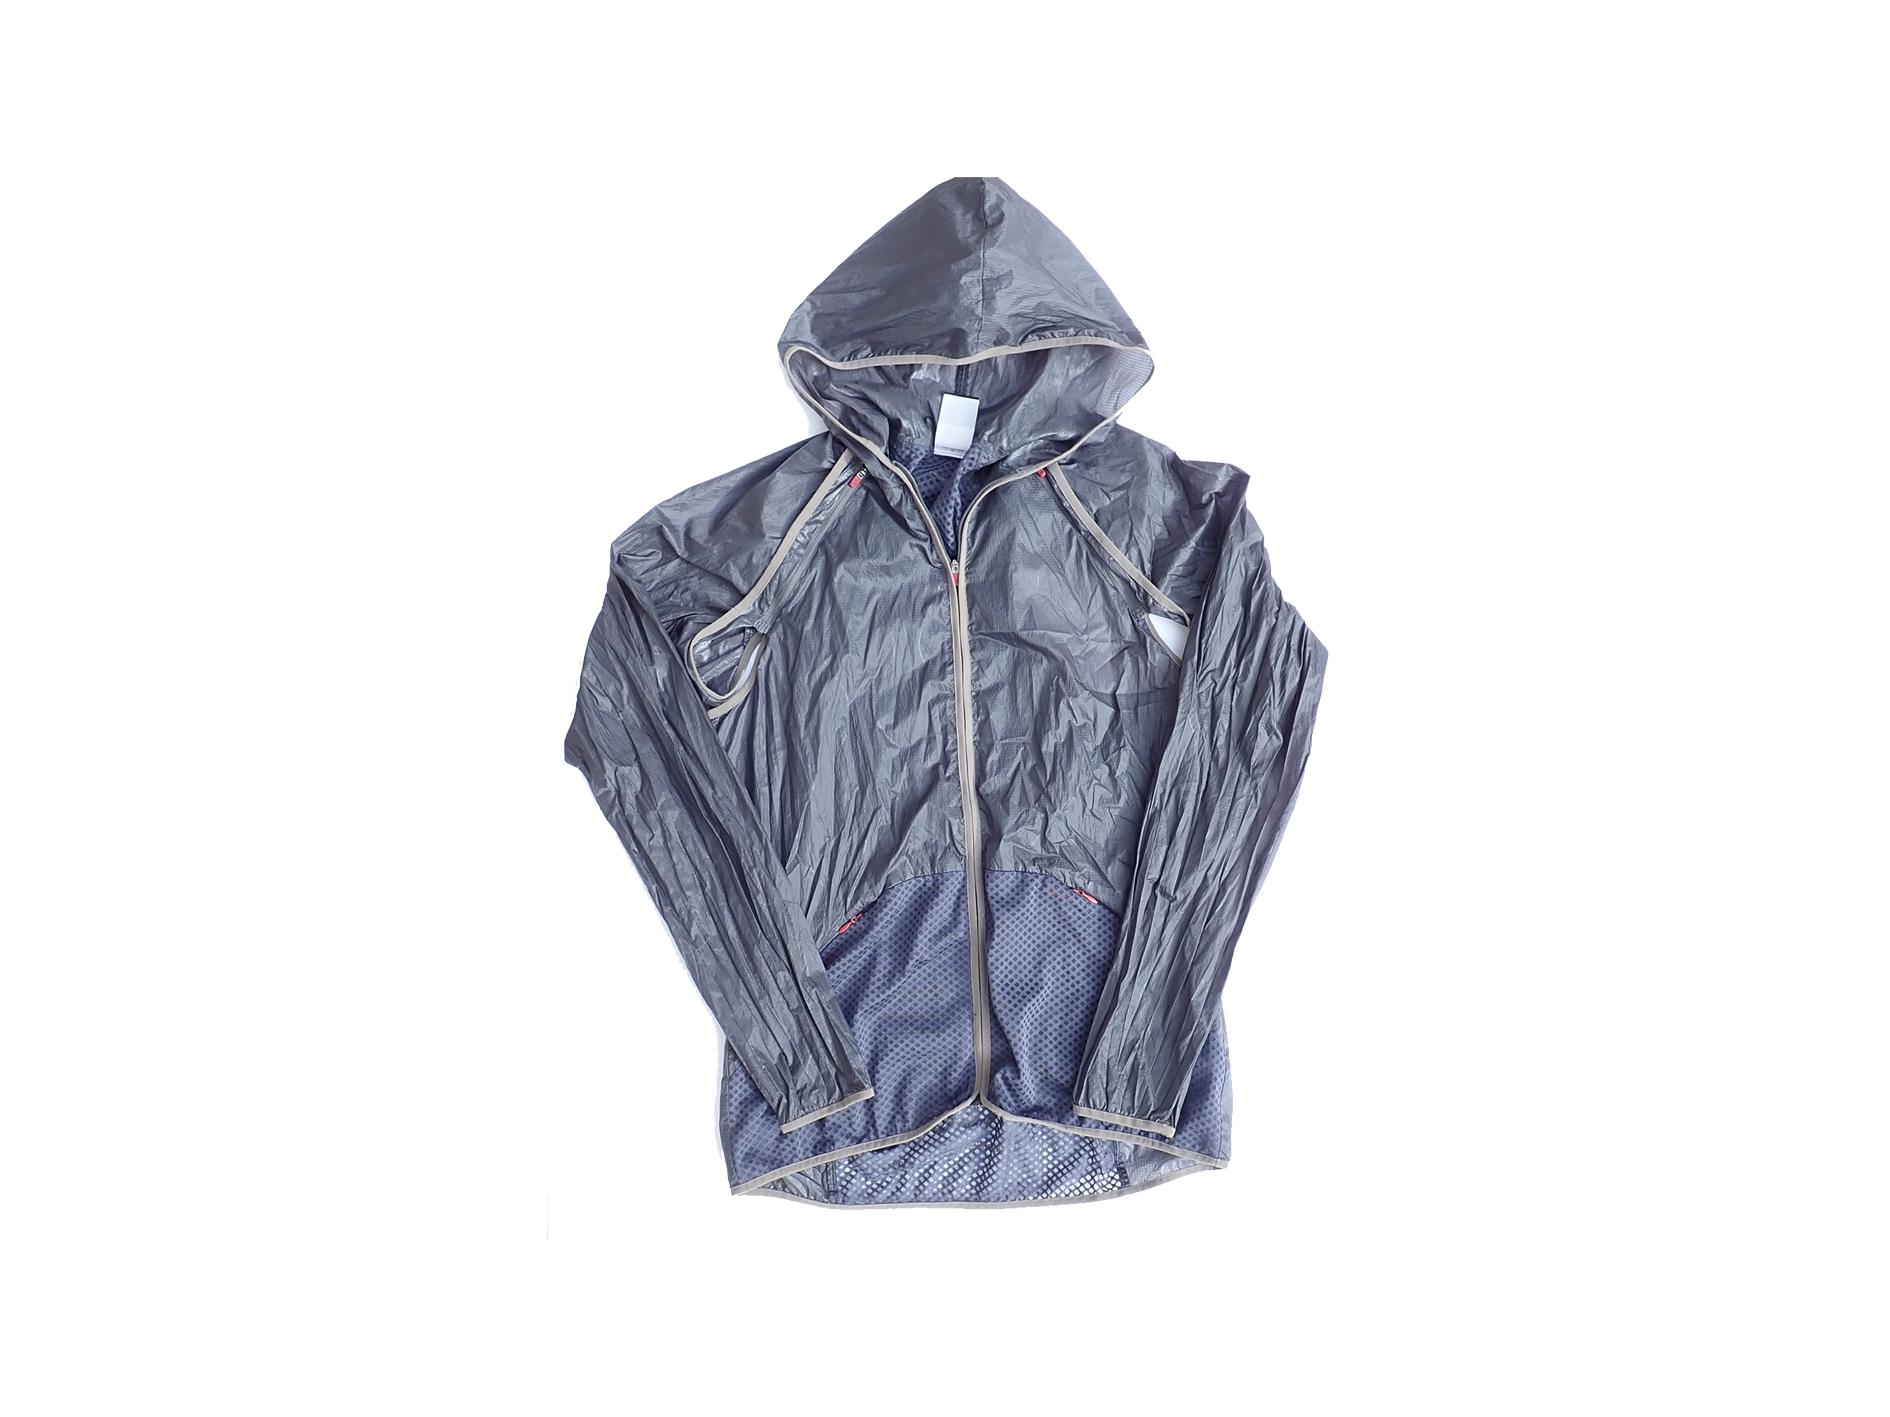 Nikelab X Gyakusou As Uc Convertible Jacket